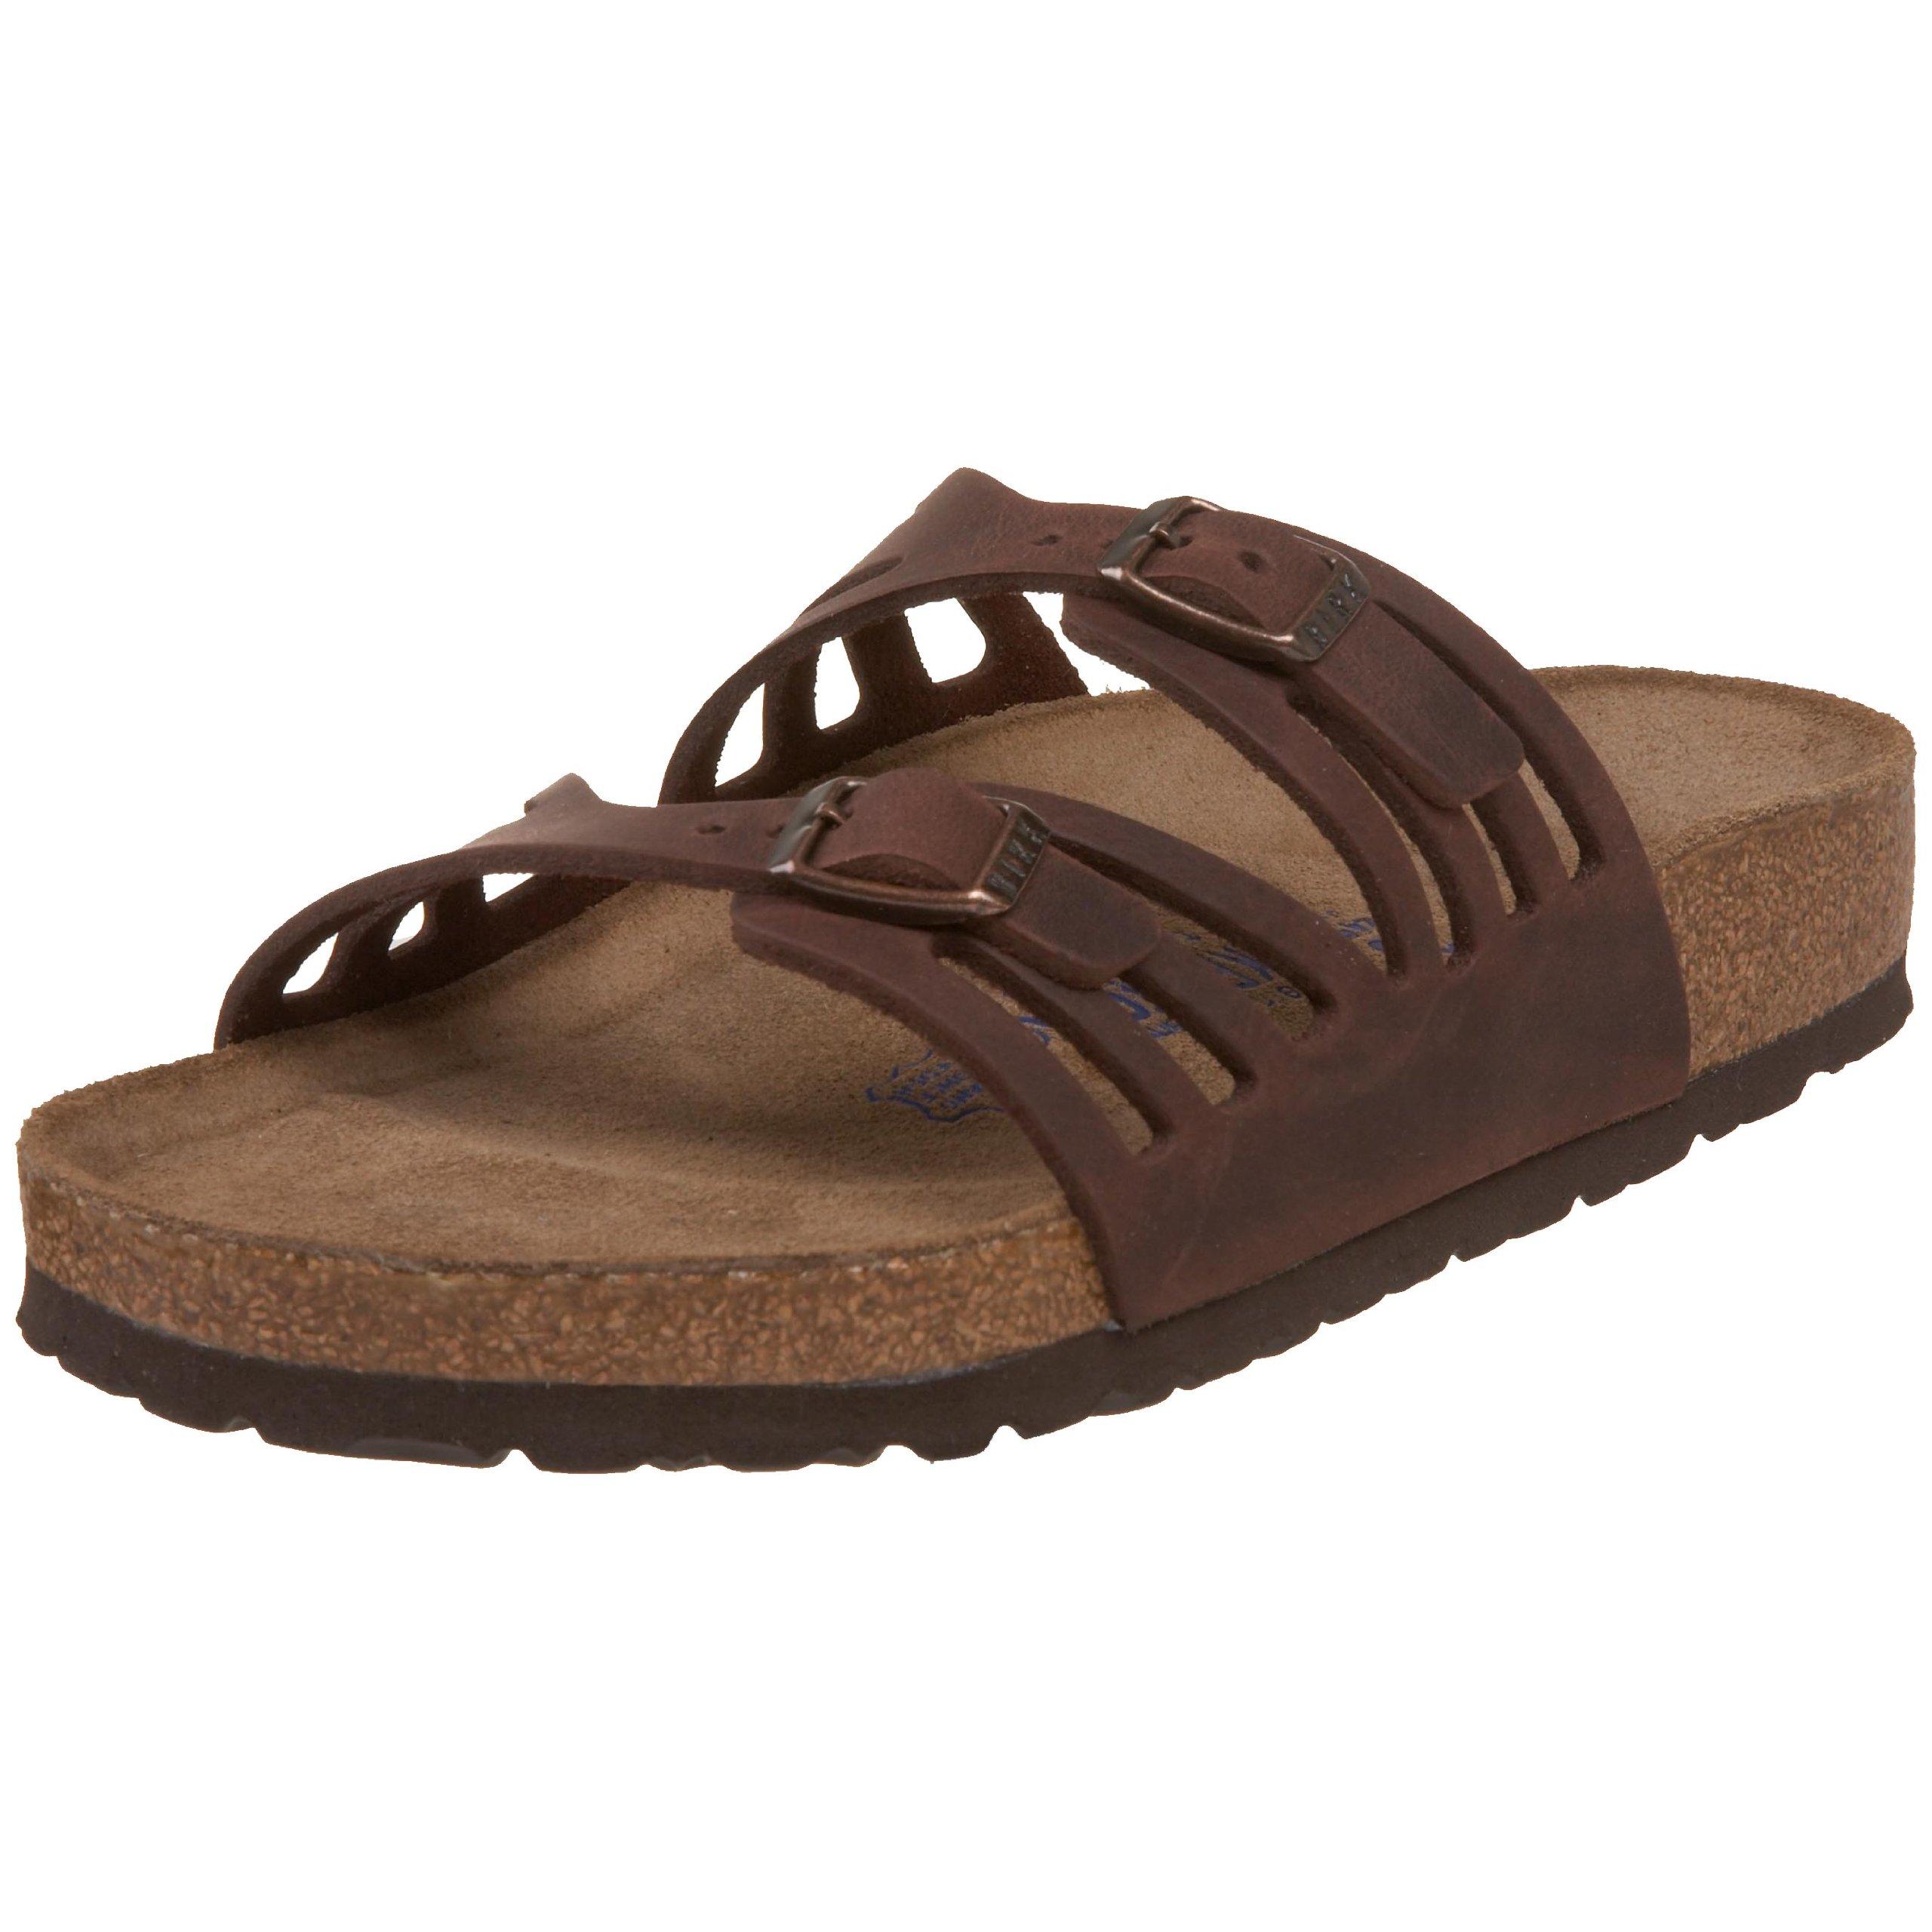 Birkenstock Women's Granada Soft Footbed Sandal,Habana Oiled Leather,39 M EU by Birkenstock